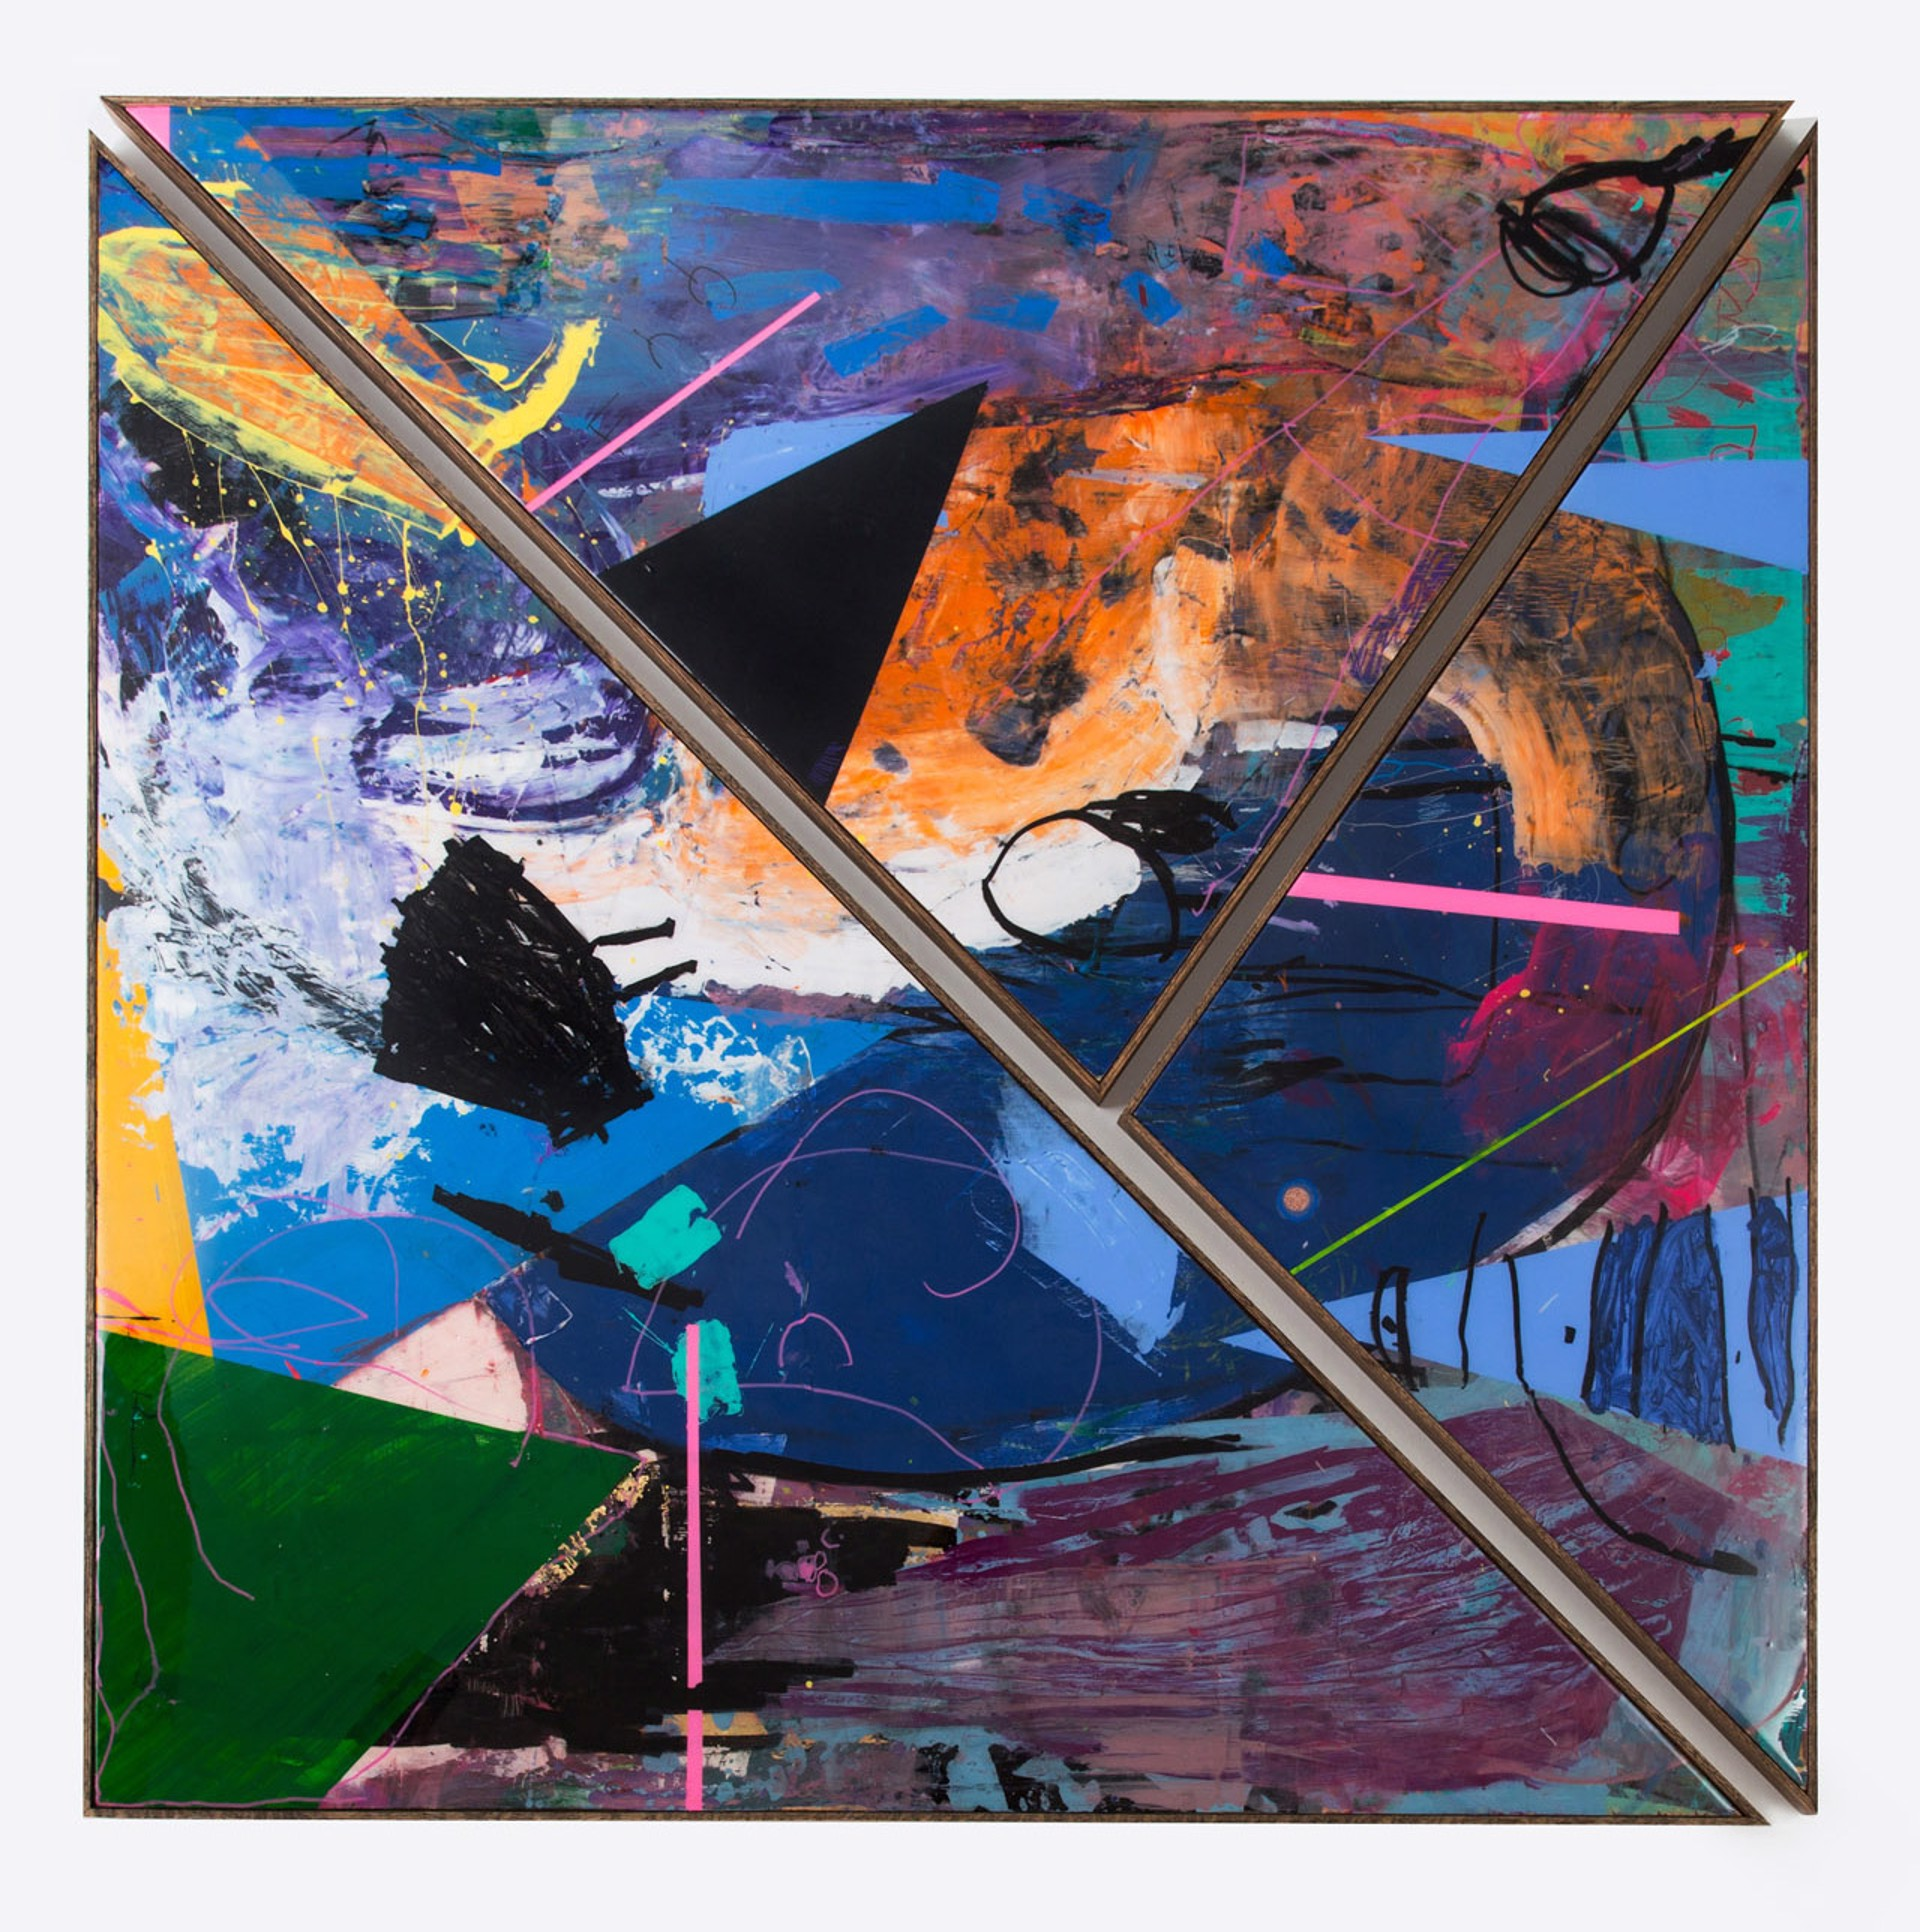 Bowser by Brandi Hofer